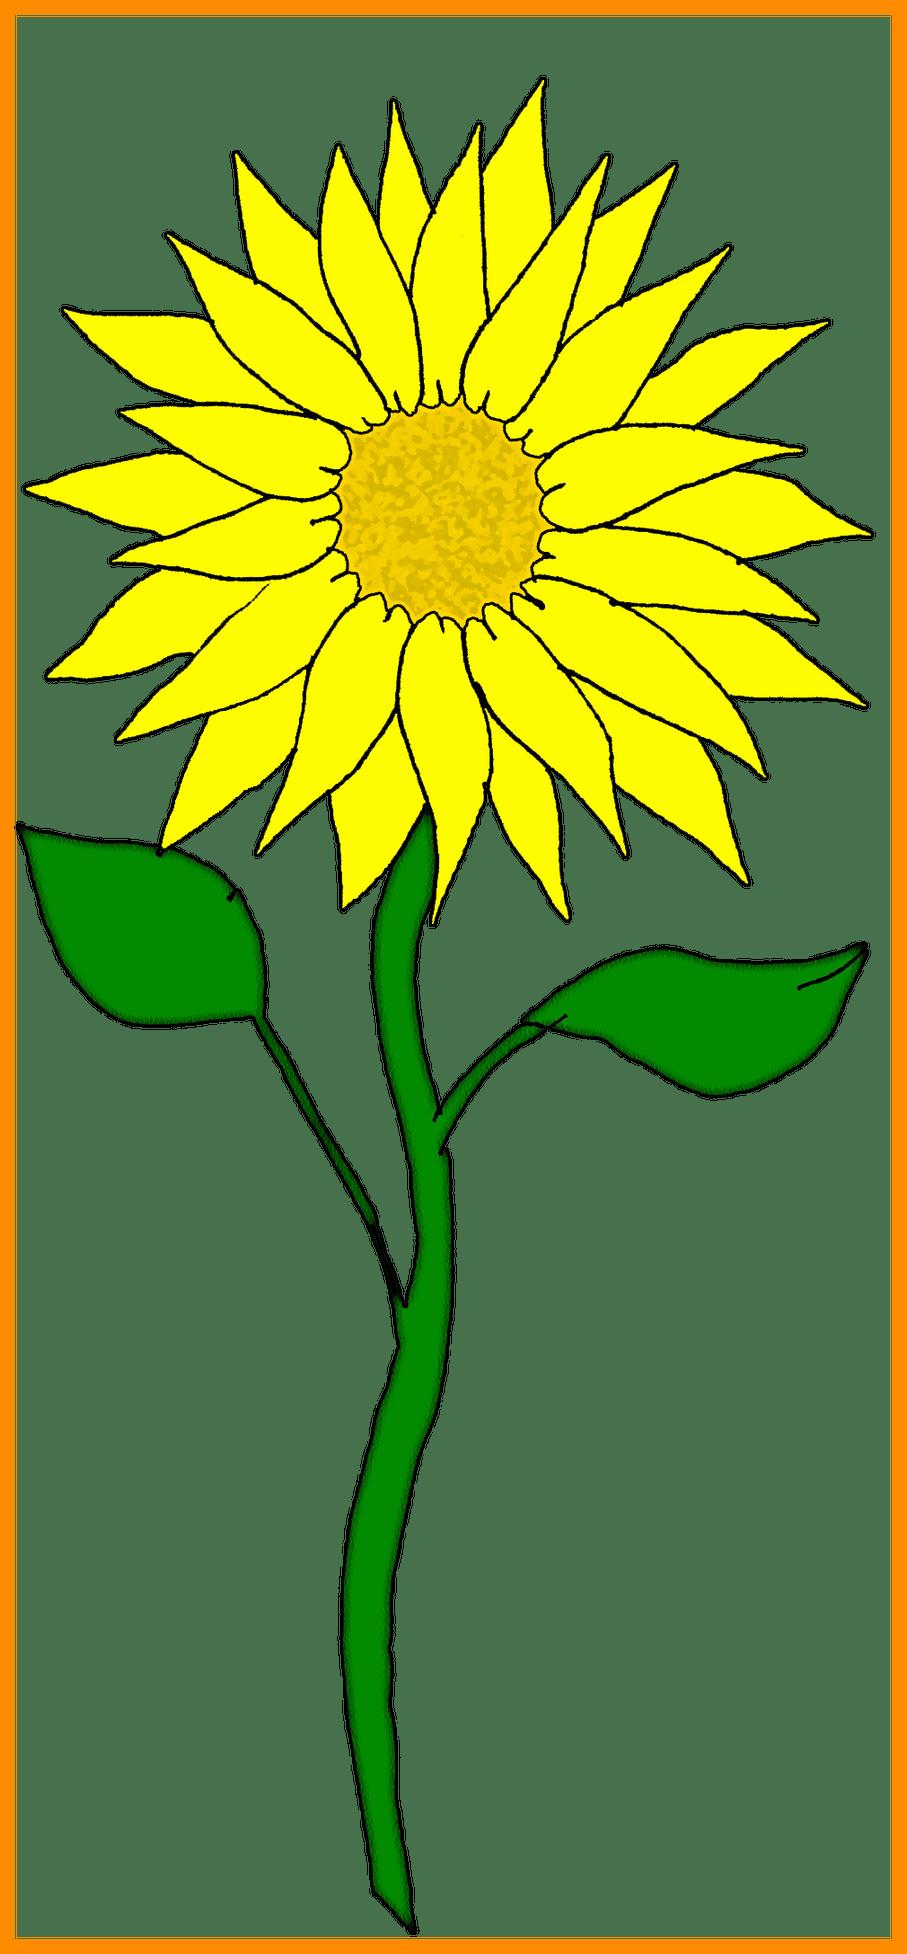 royalty free stock Stunning flower pict for. Clipart sunflower